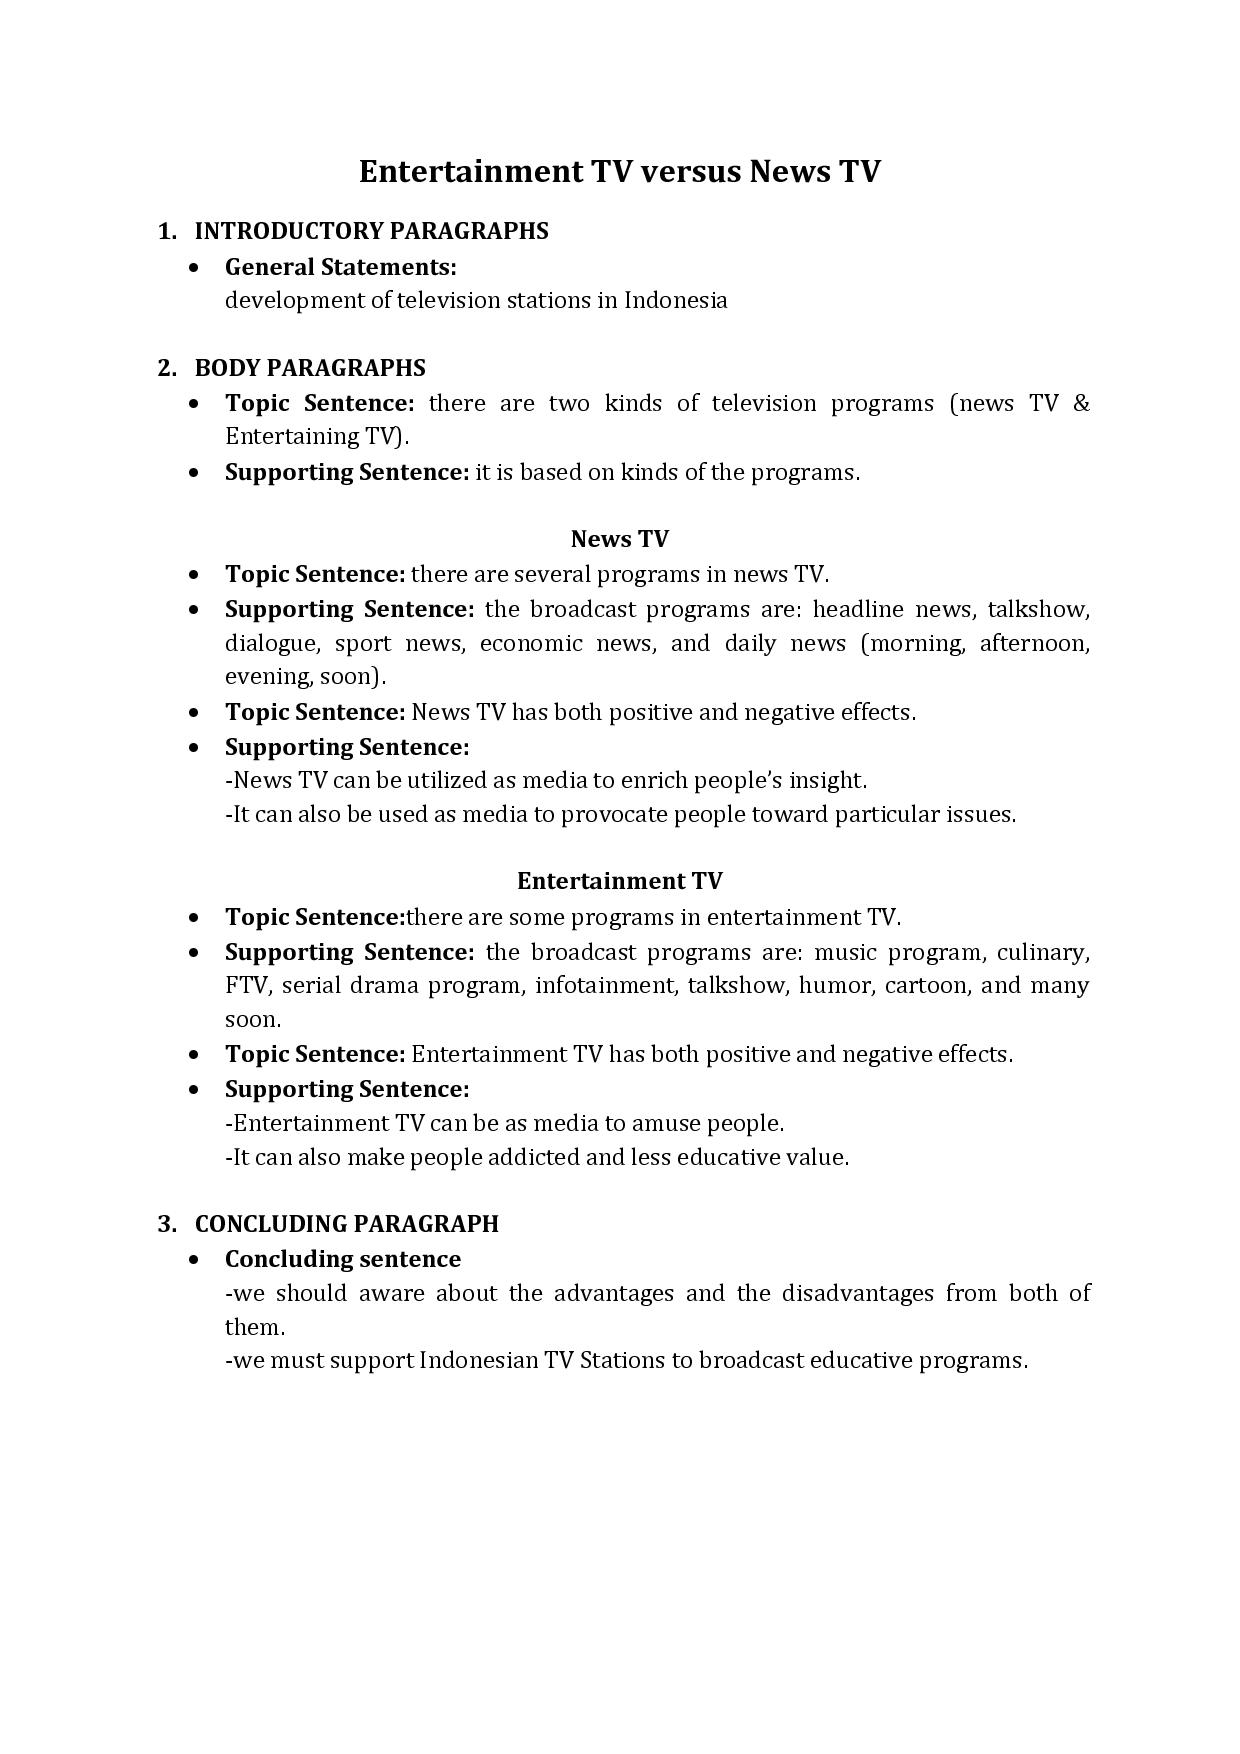 012 College Essay Outlines And Search On Pinterest In Format Of Impressive Outline Argumentative Sample Mla Full